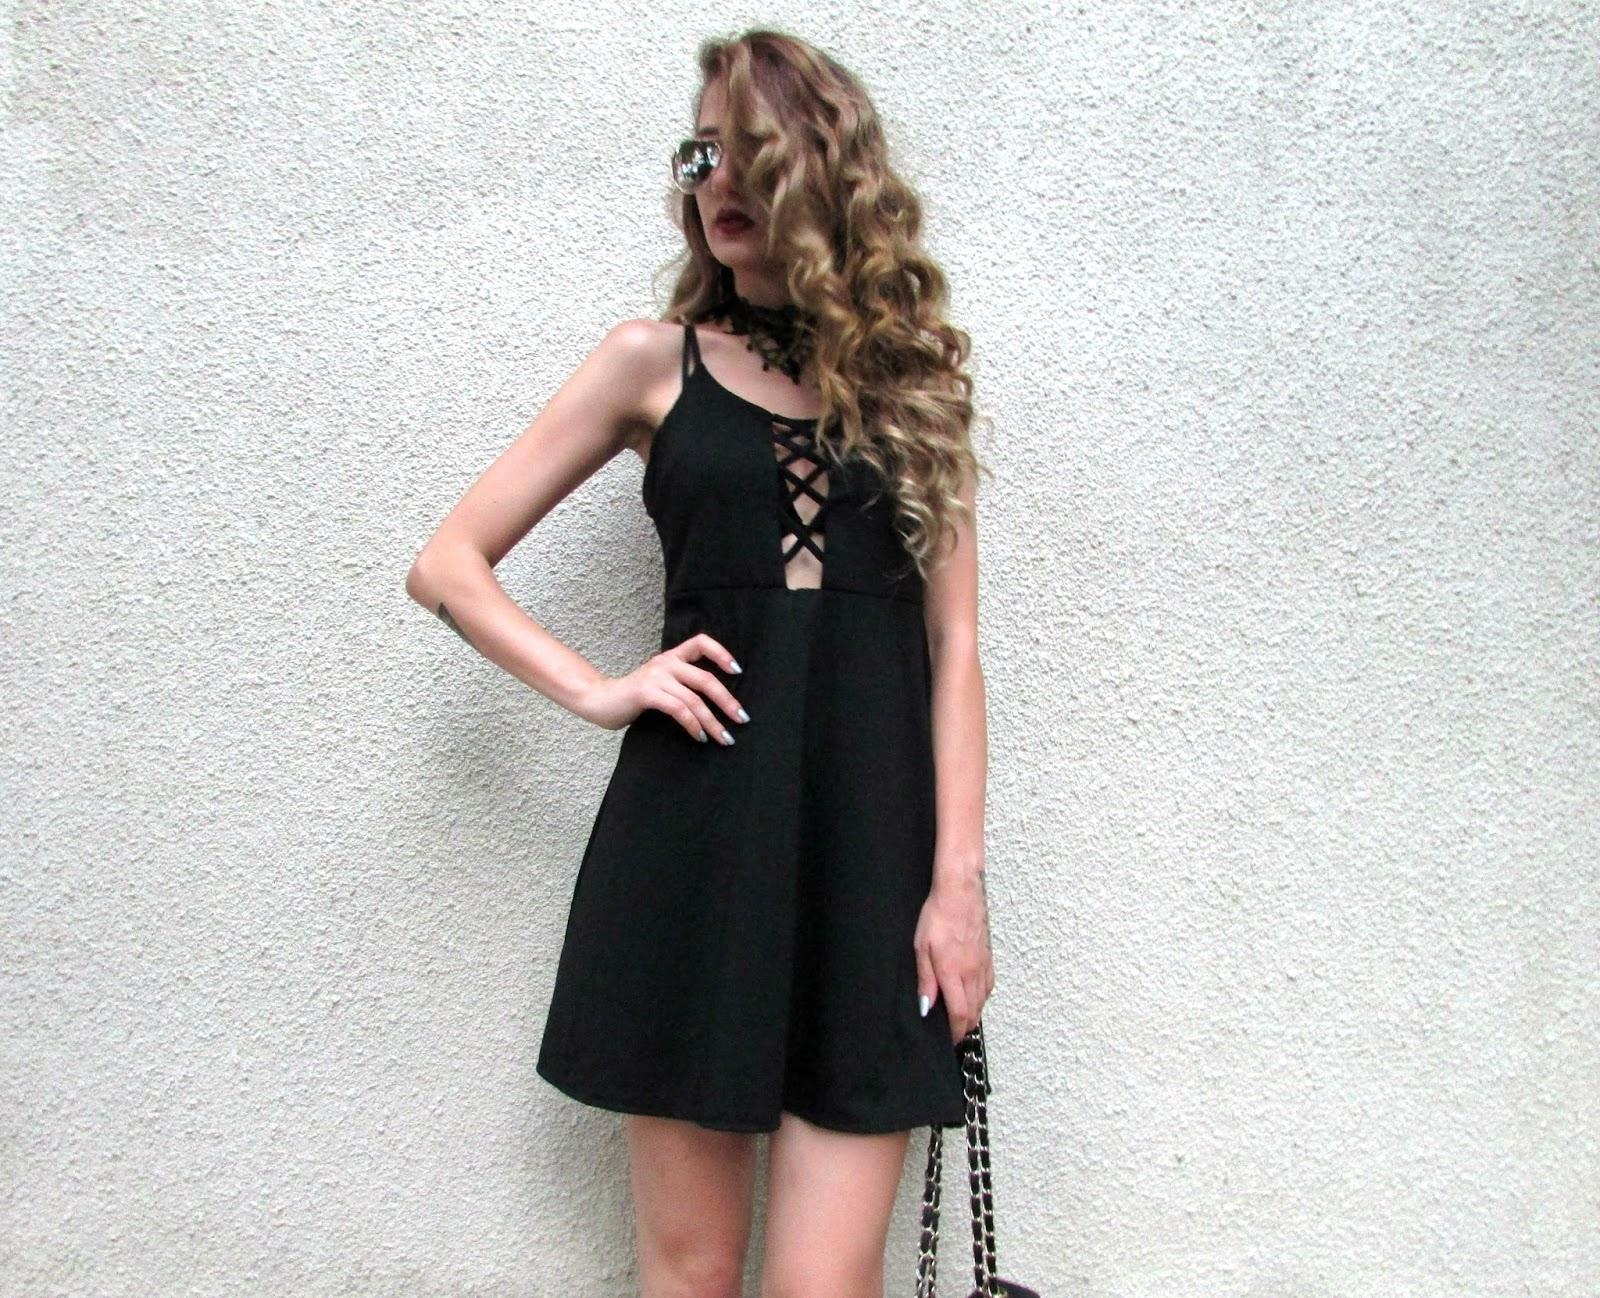 283b950a810 SASSY LITTLE BLACK DRESS | Venetia Kamara Blog | Bloglovin'